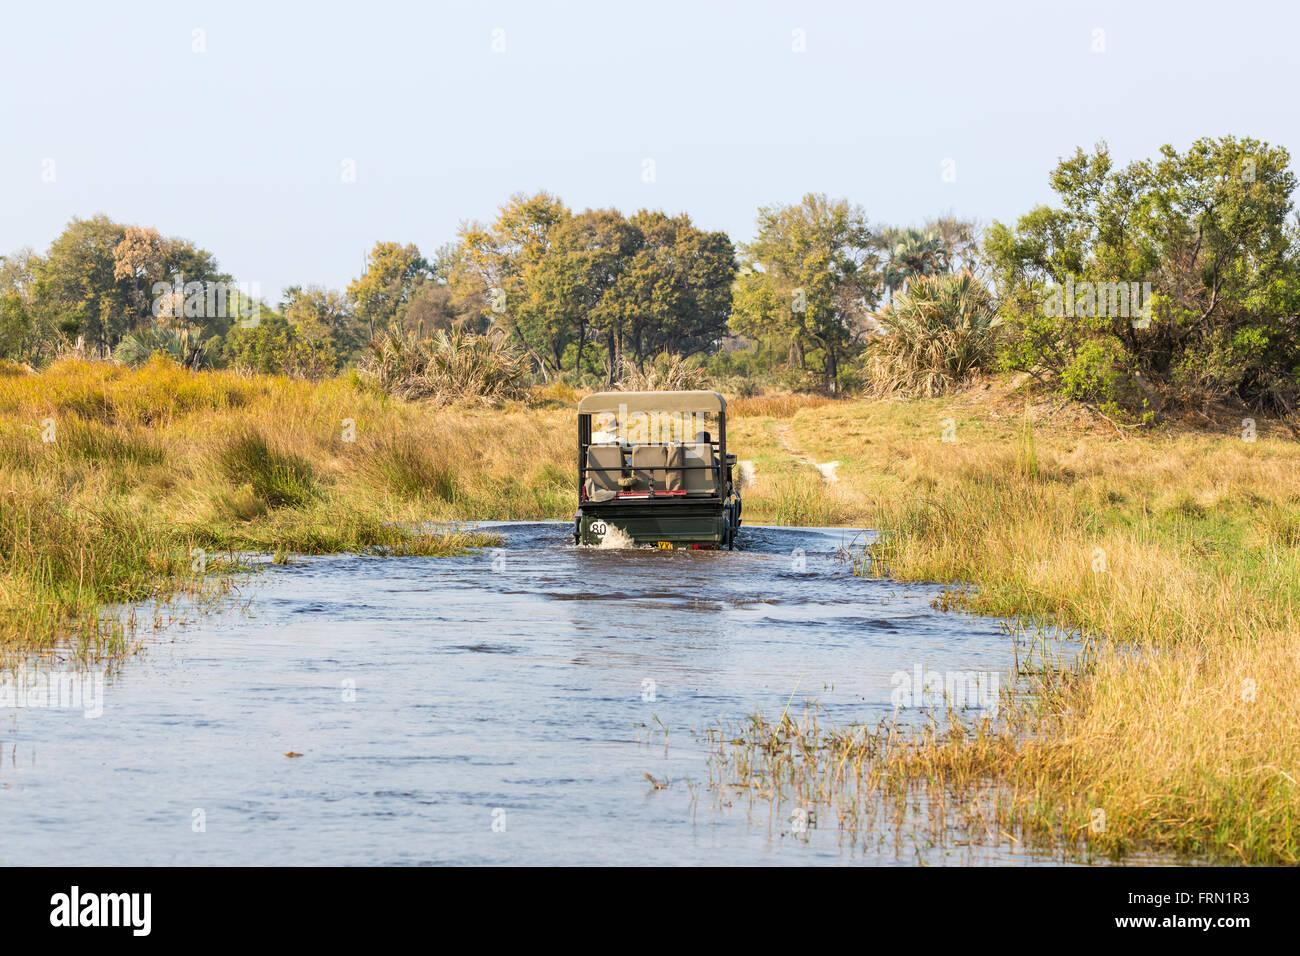 Safari 4wd jeep crossing a river ford, Sandibe Camp, by the Moremi Game Reserve, Okavango Delta, Botswana, southern - Stock Image